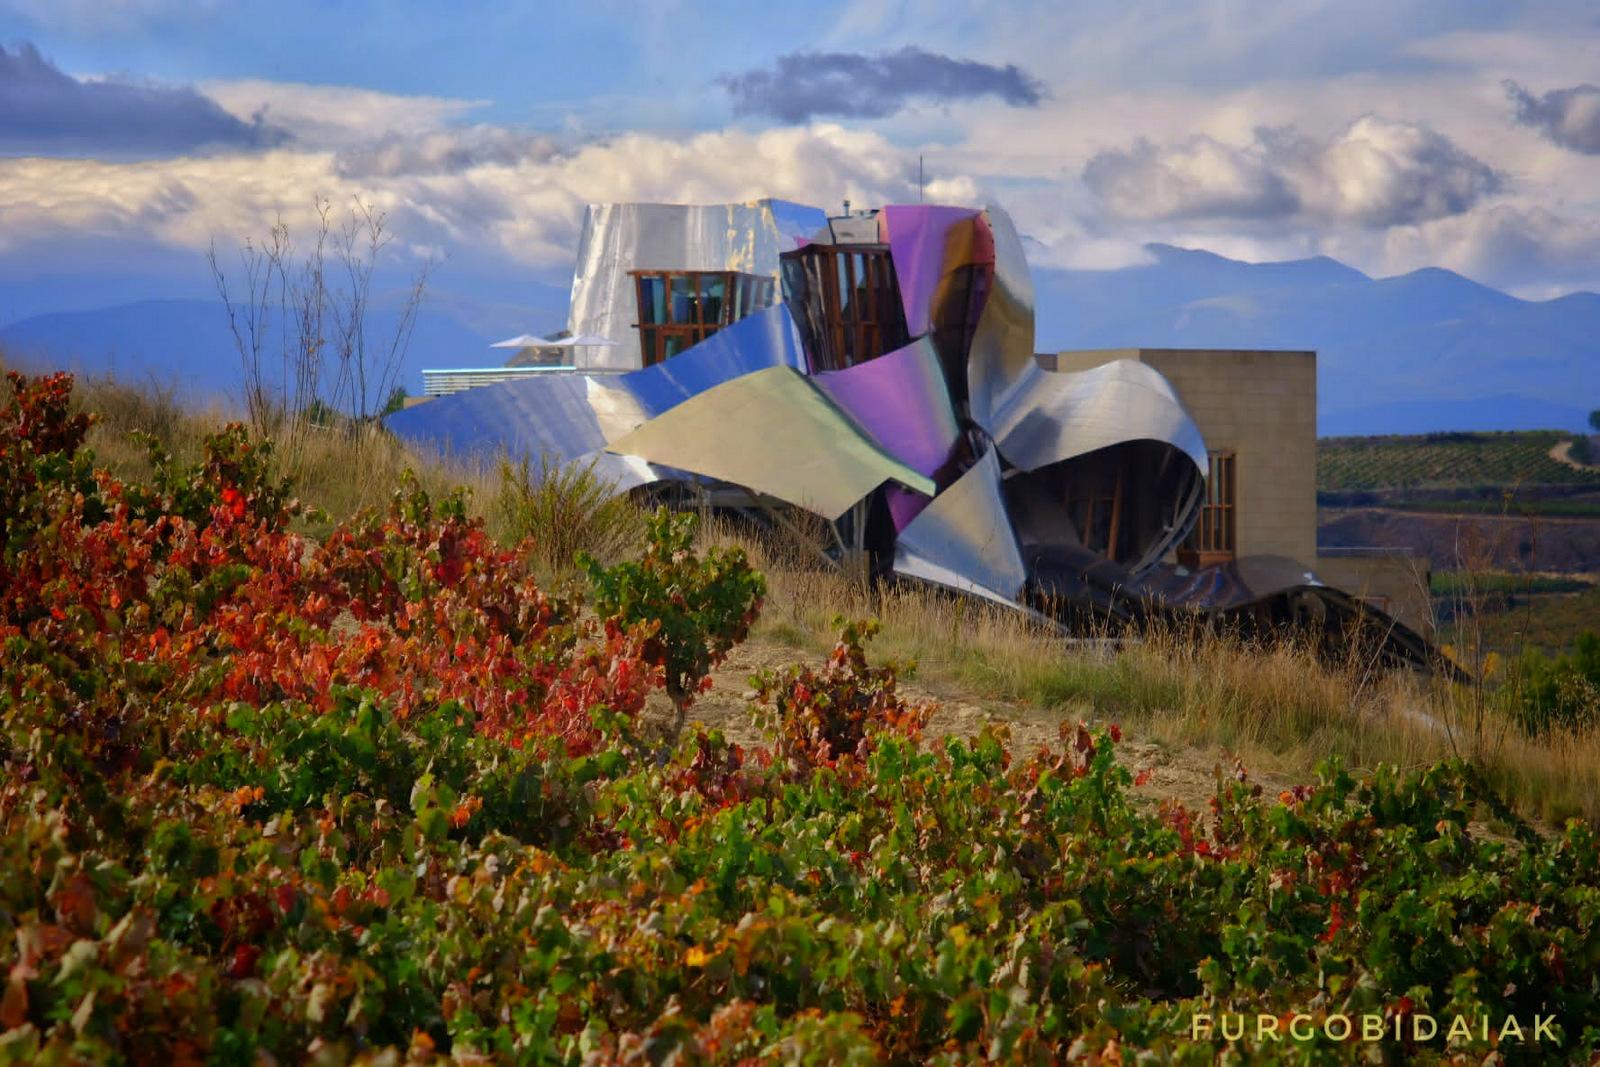 La Rioja Alavesa, bodegas Marqués de Riscal, paseando entre viñedos